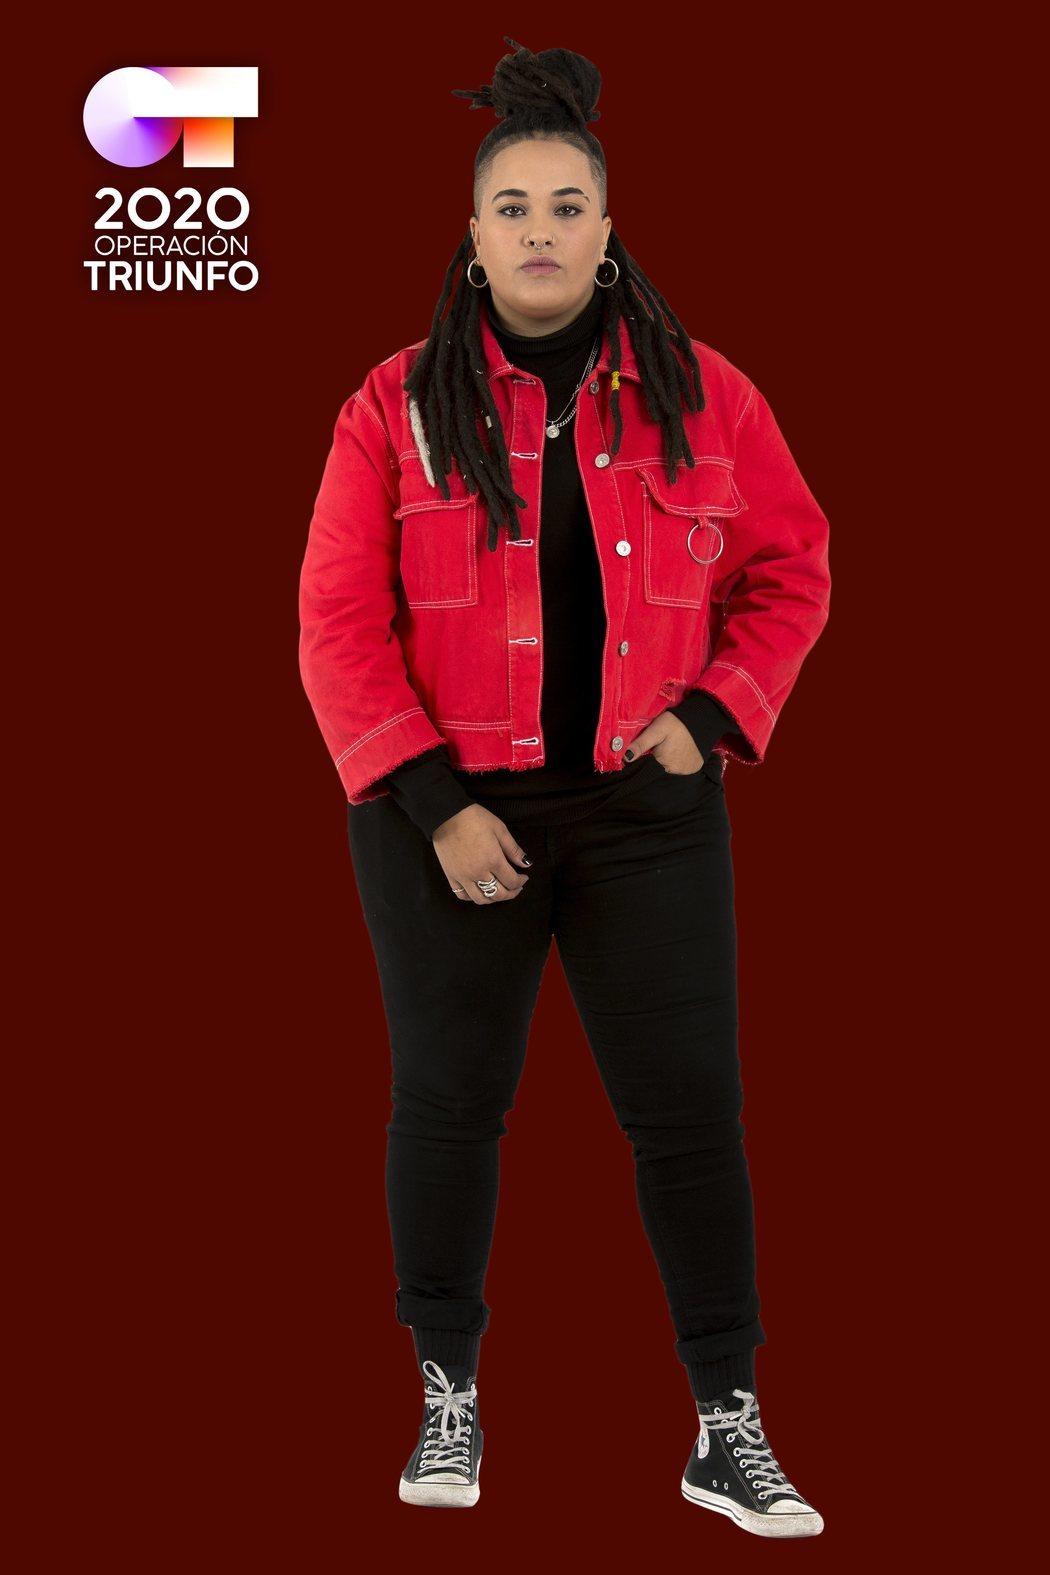 Posado de Eli Sánchez, concursante de 'OT 2020'